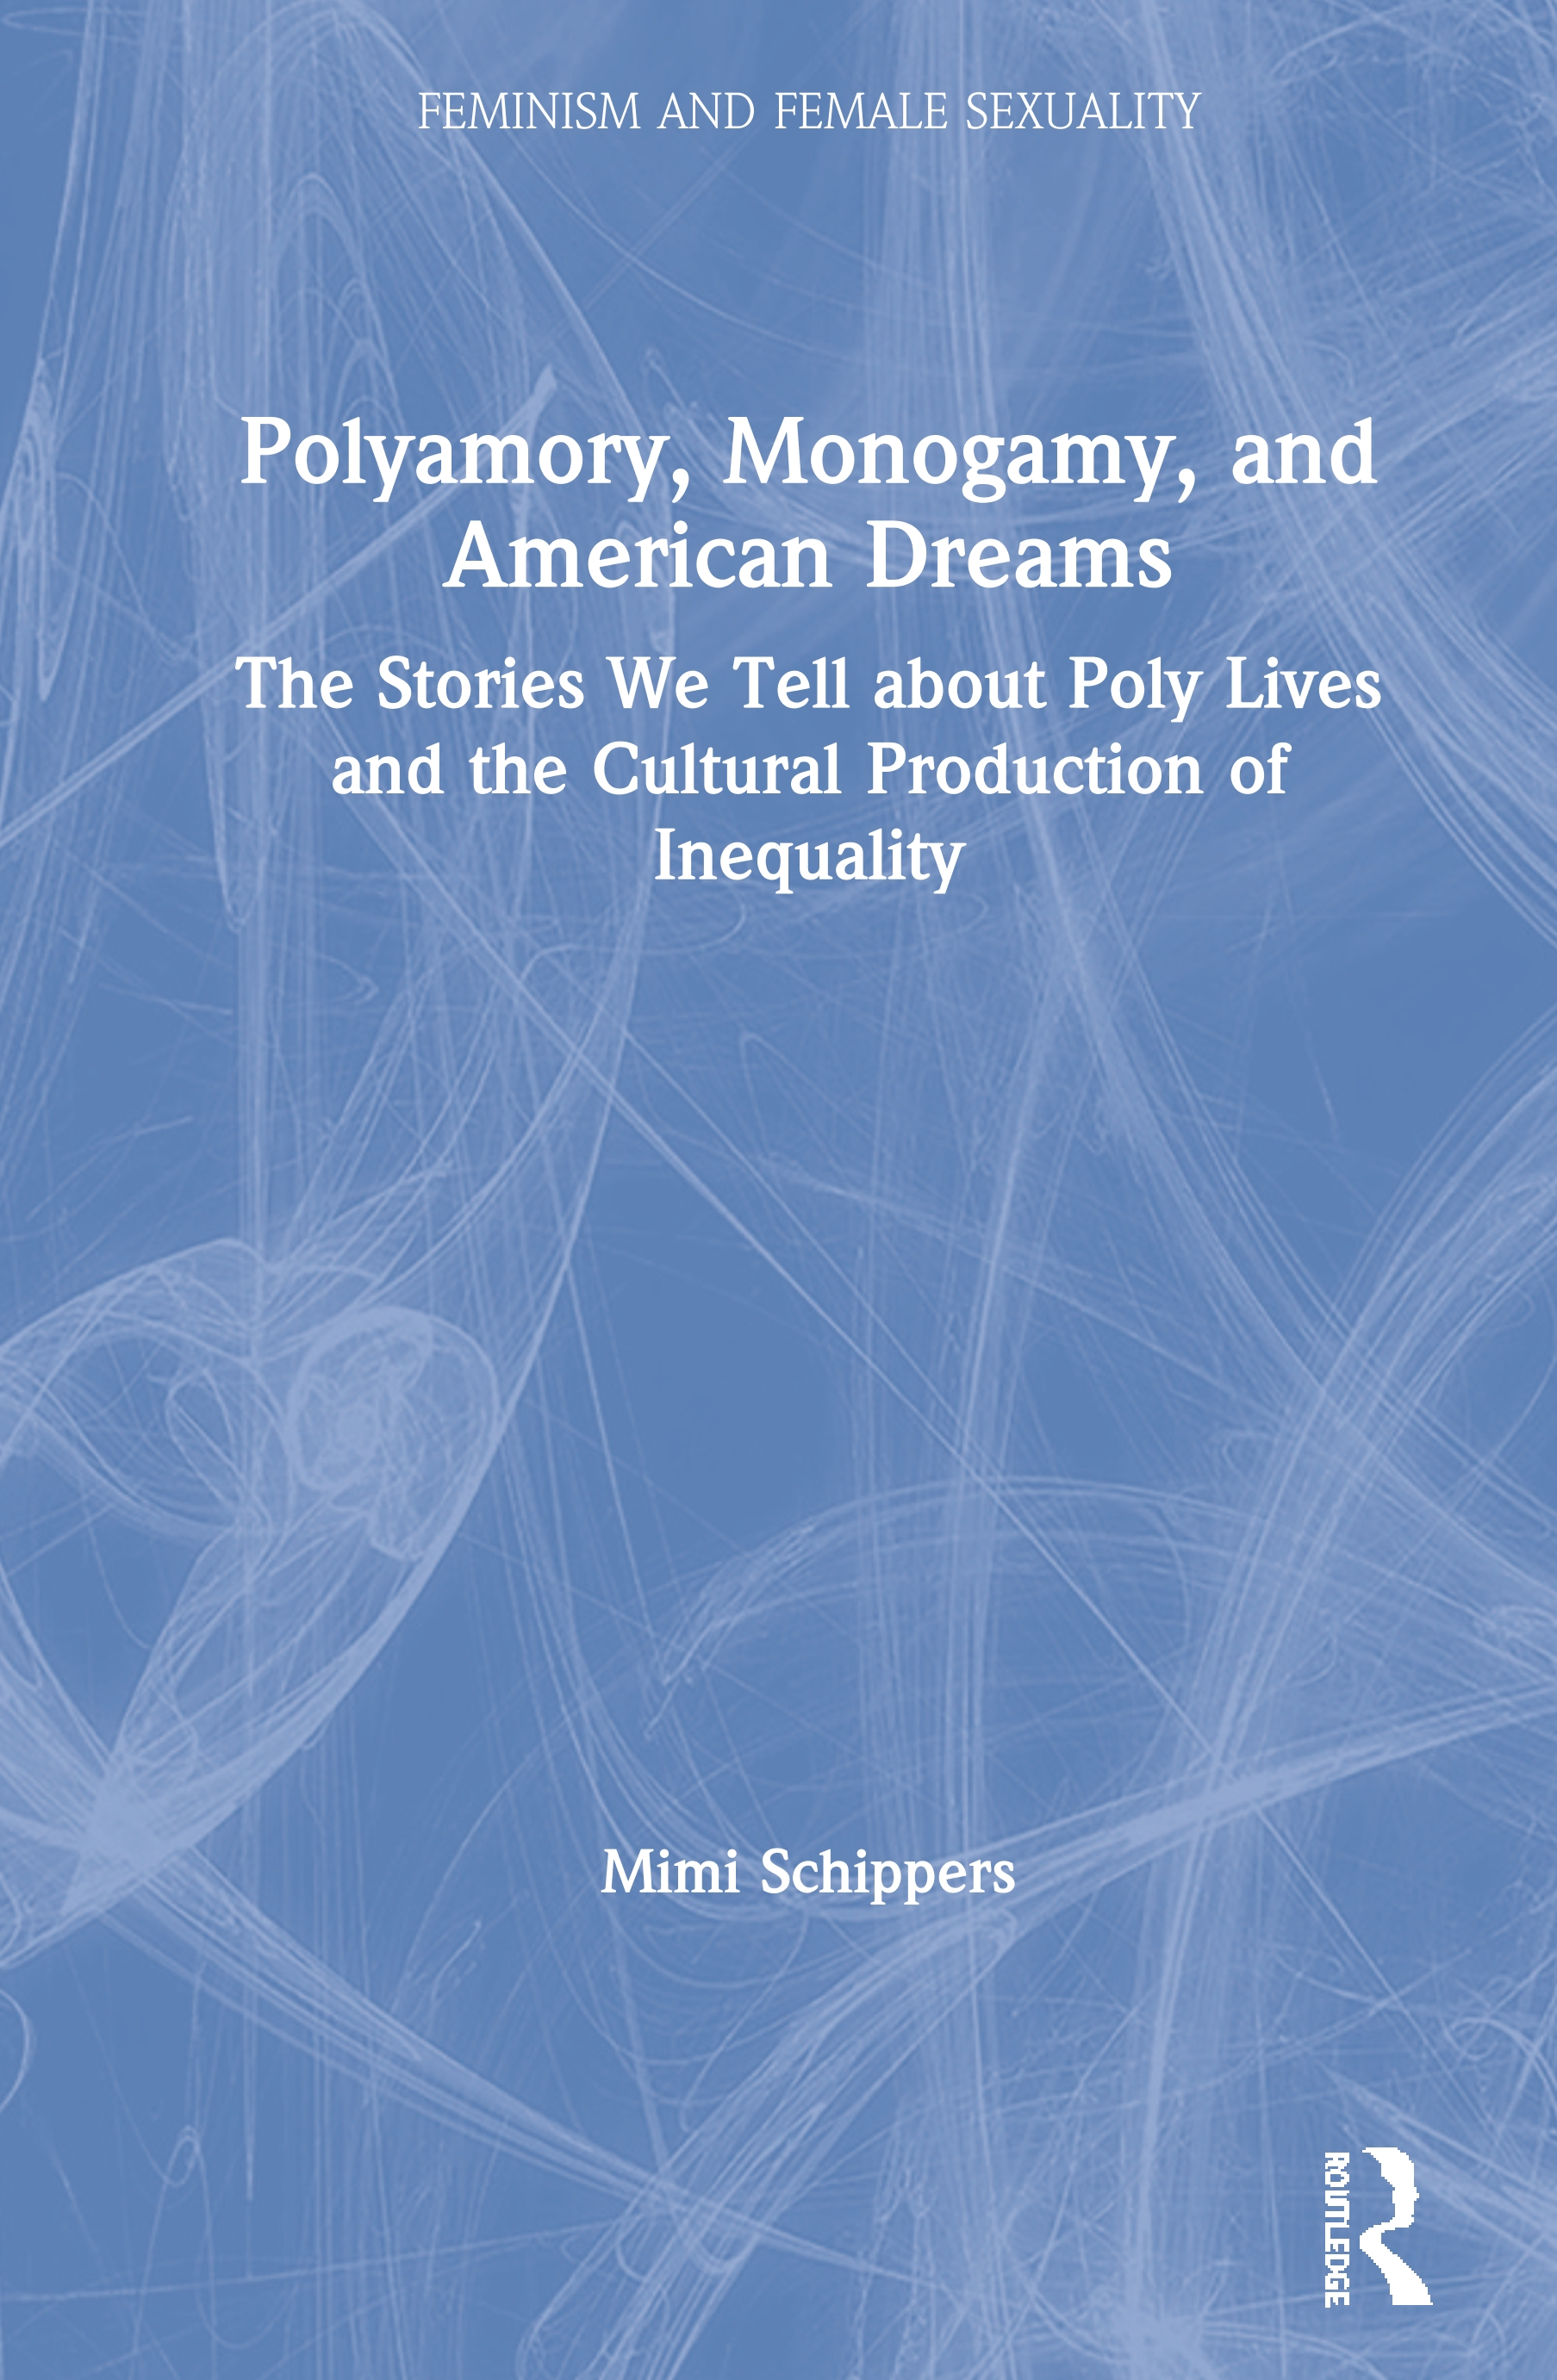 Polyamory, Monogamy, and American Dreams